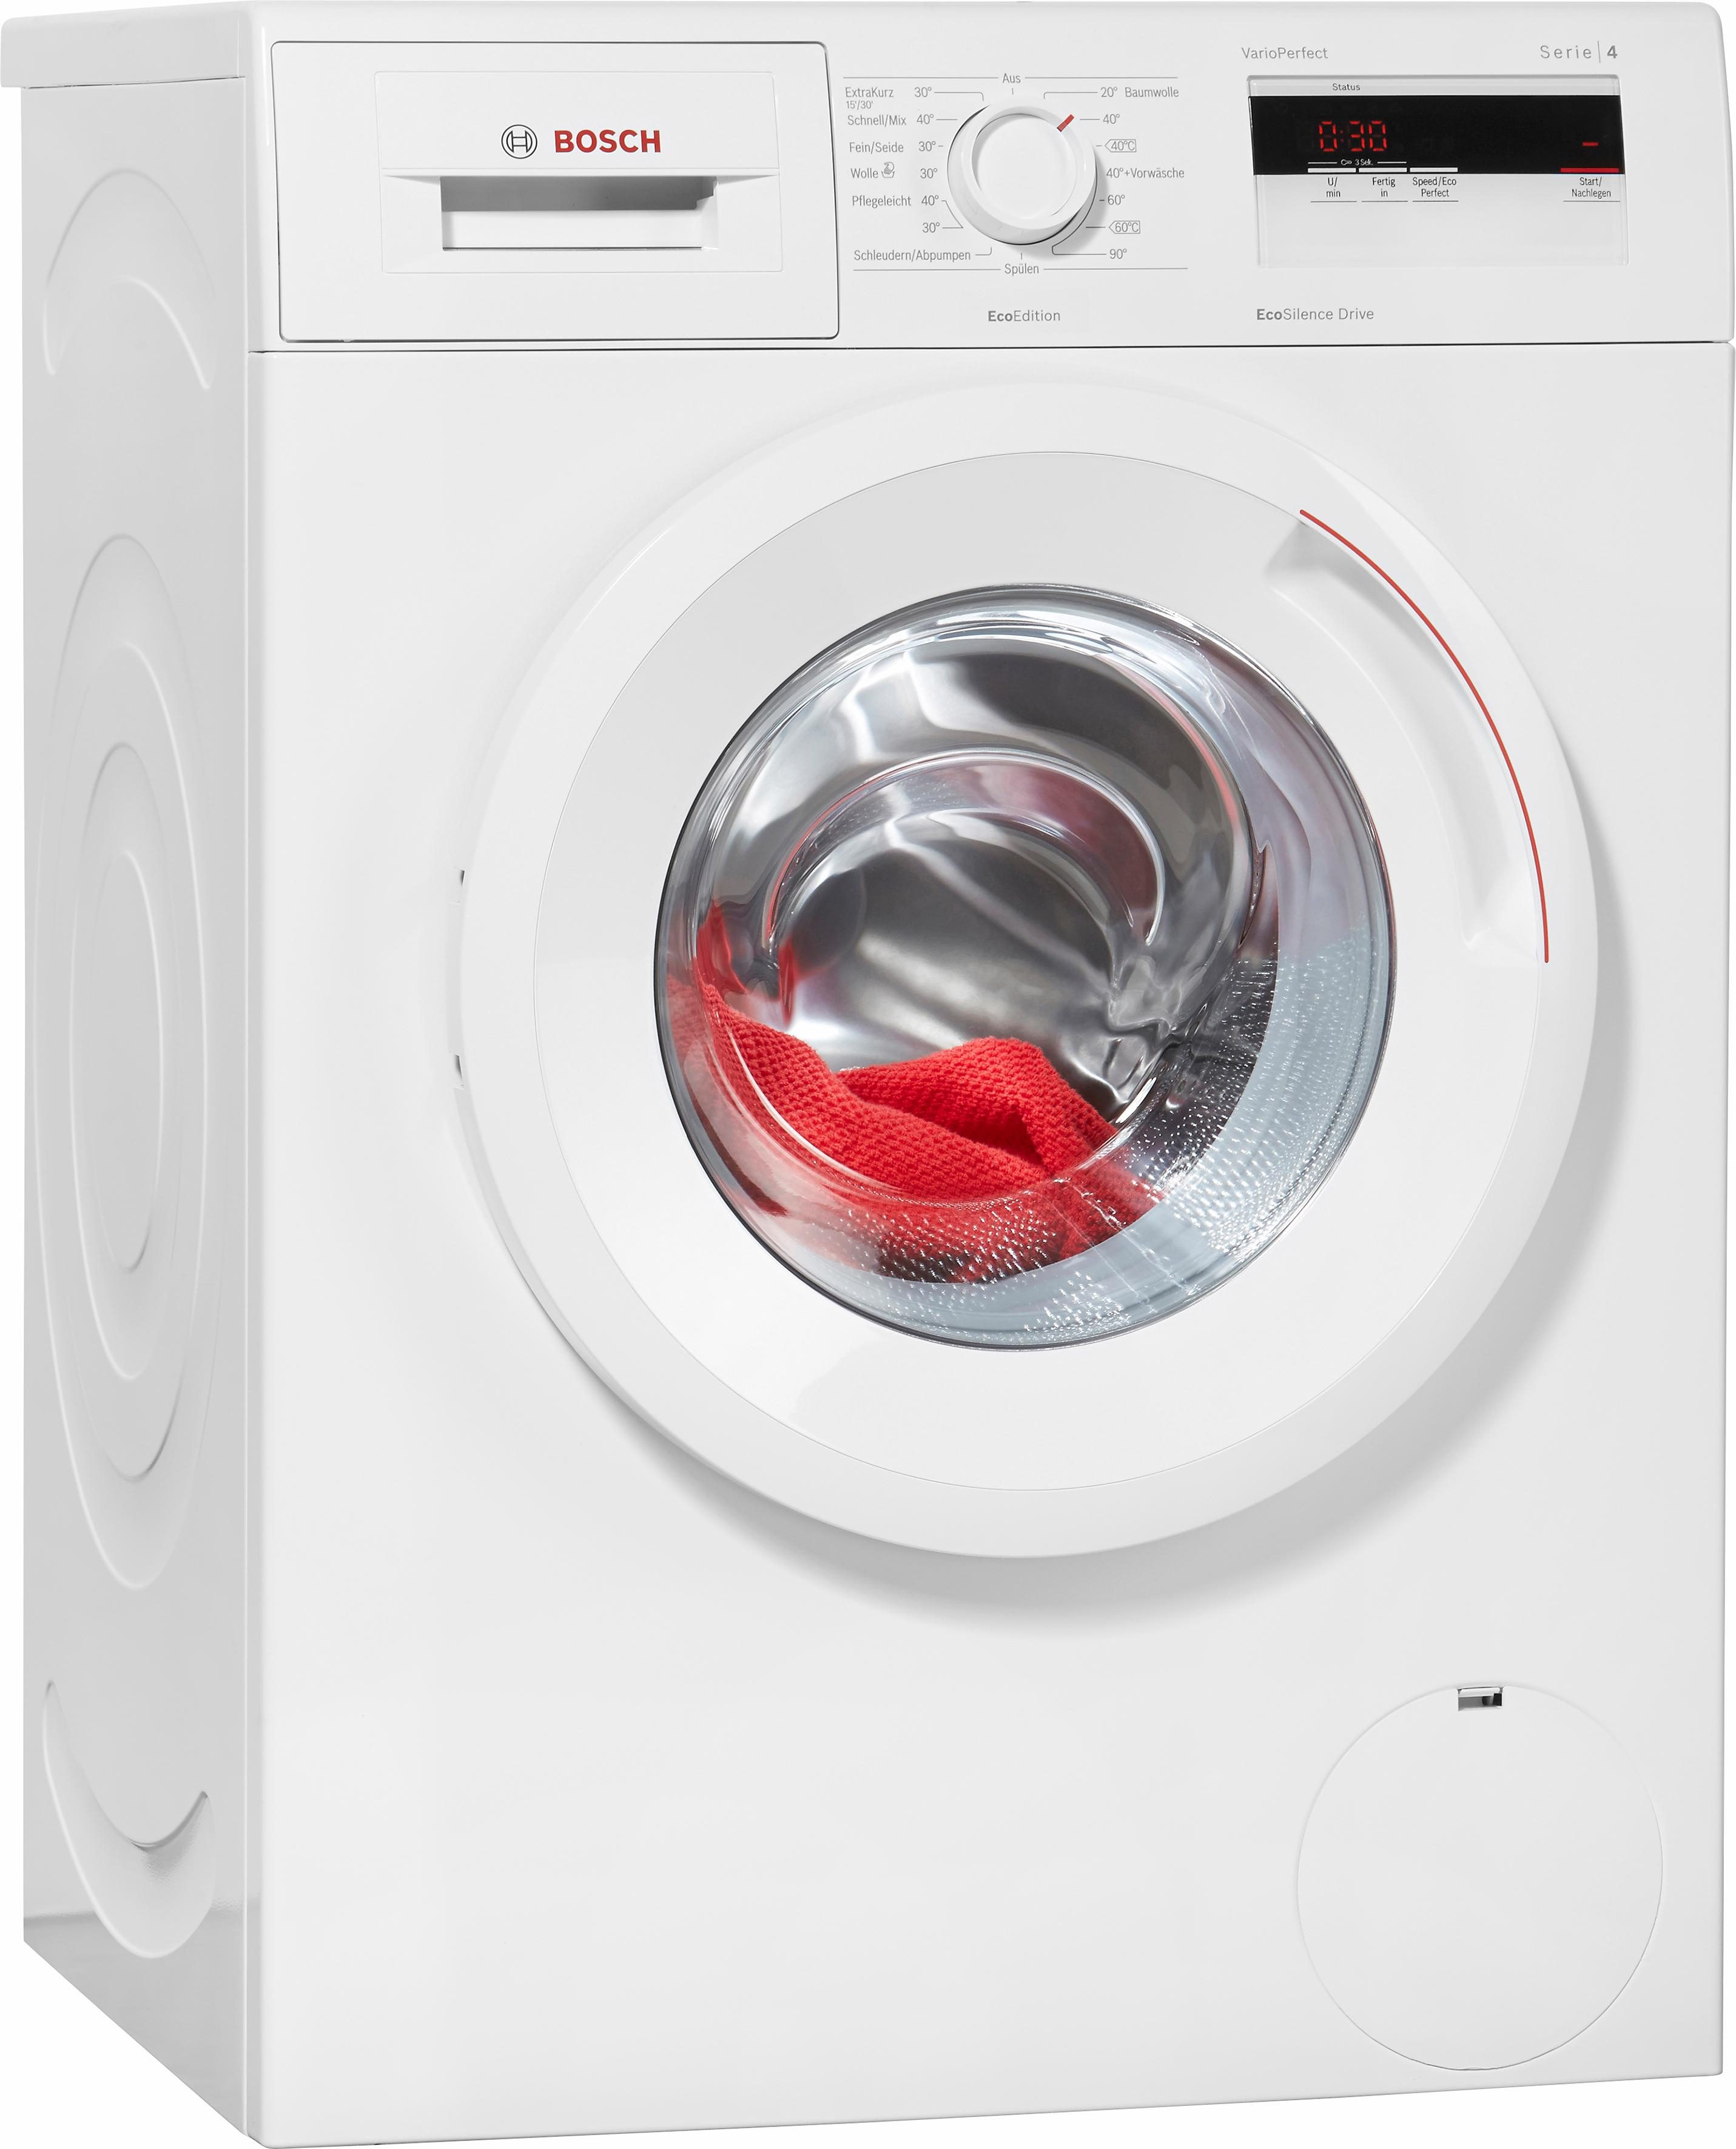 BOSCH Waschmaschine Serie 4 WAN280ECO, A+++, 6 kg, 1400 U/Min